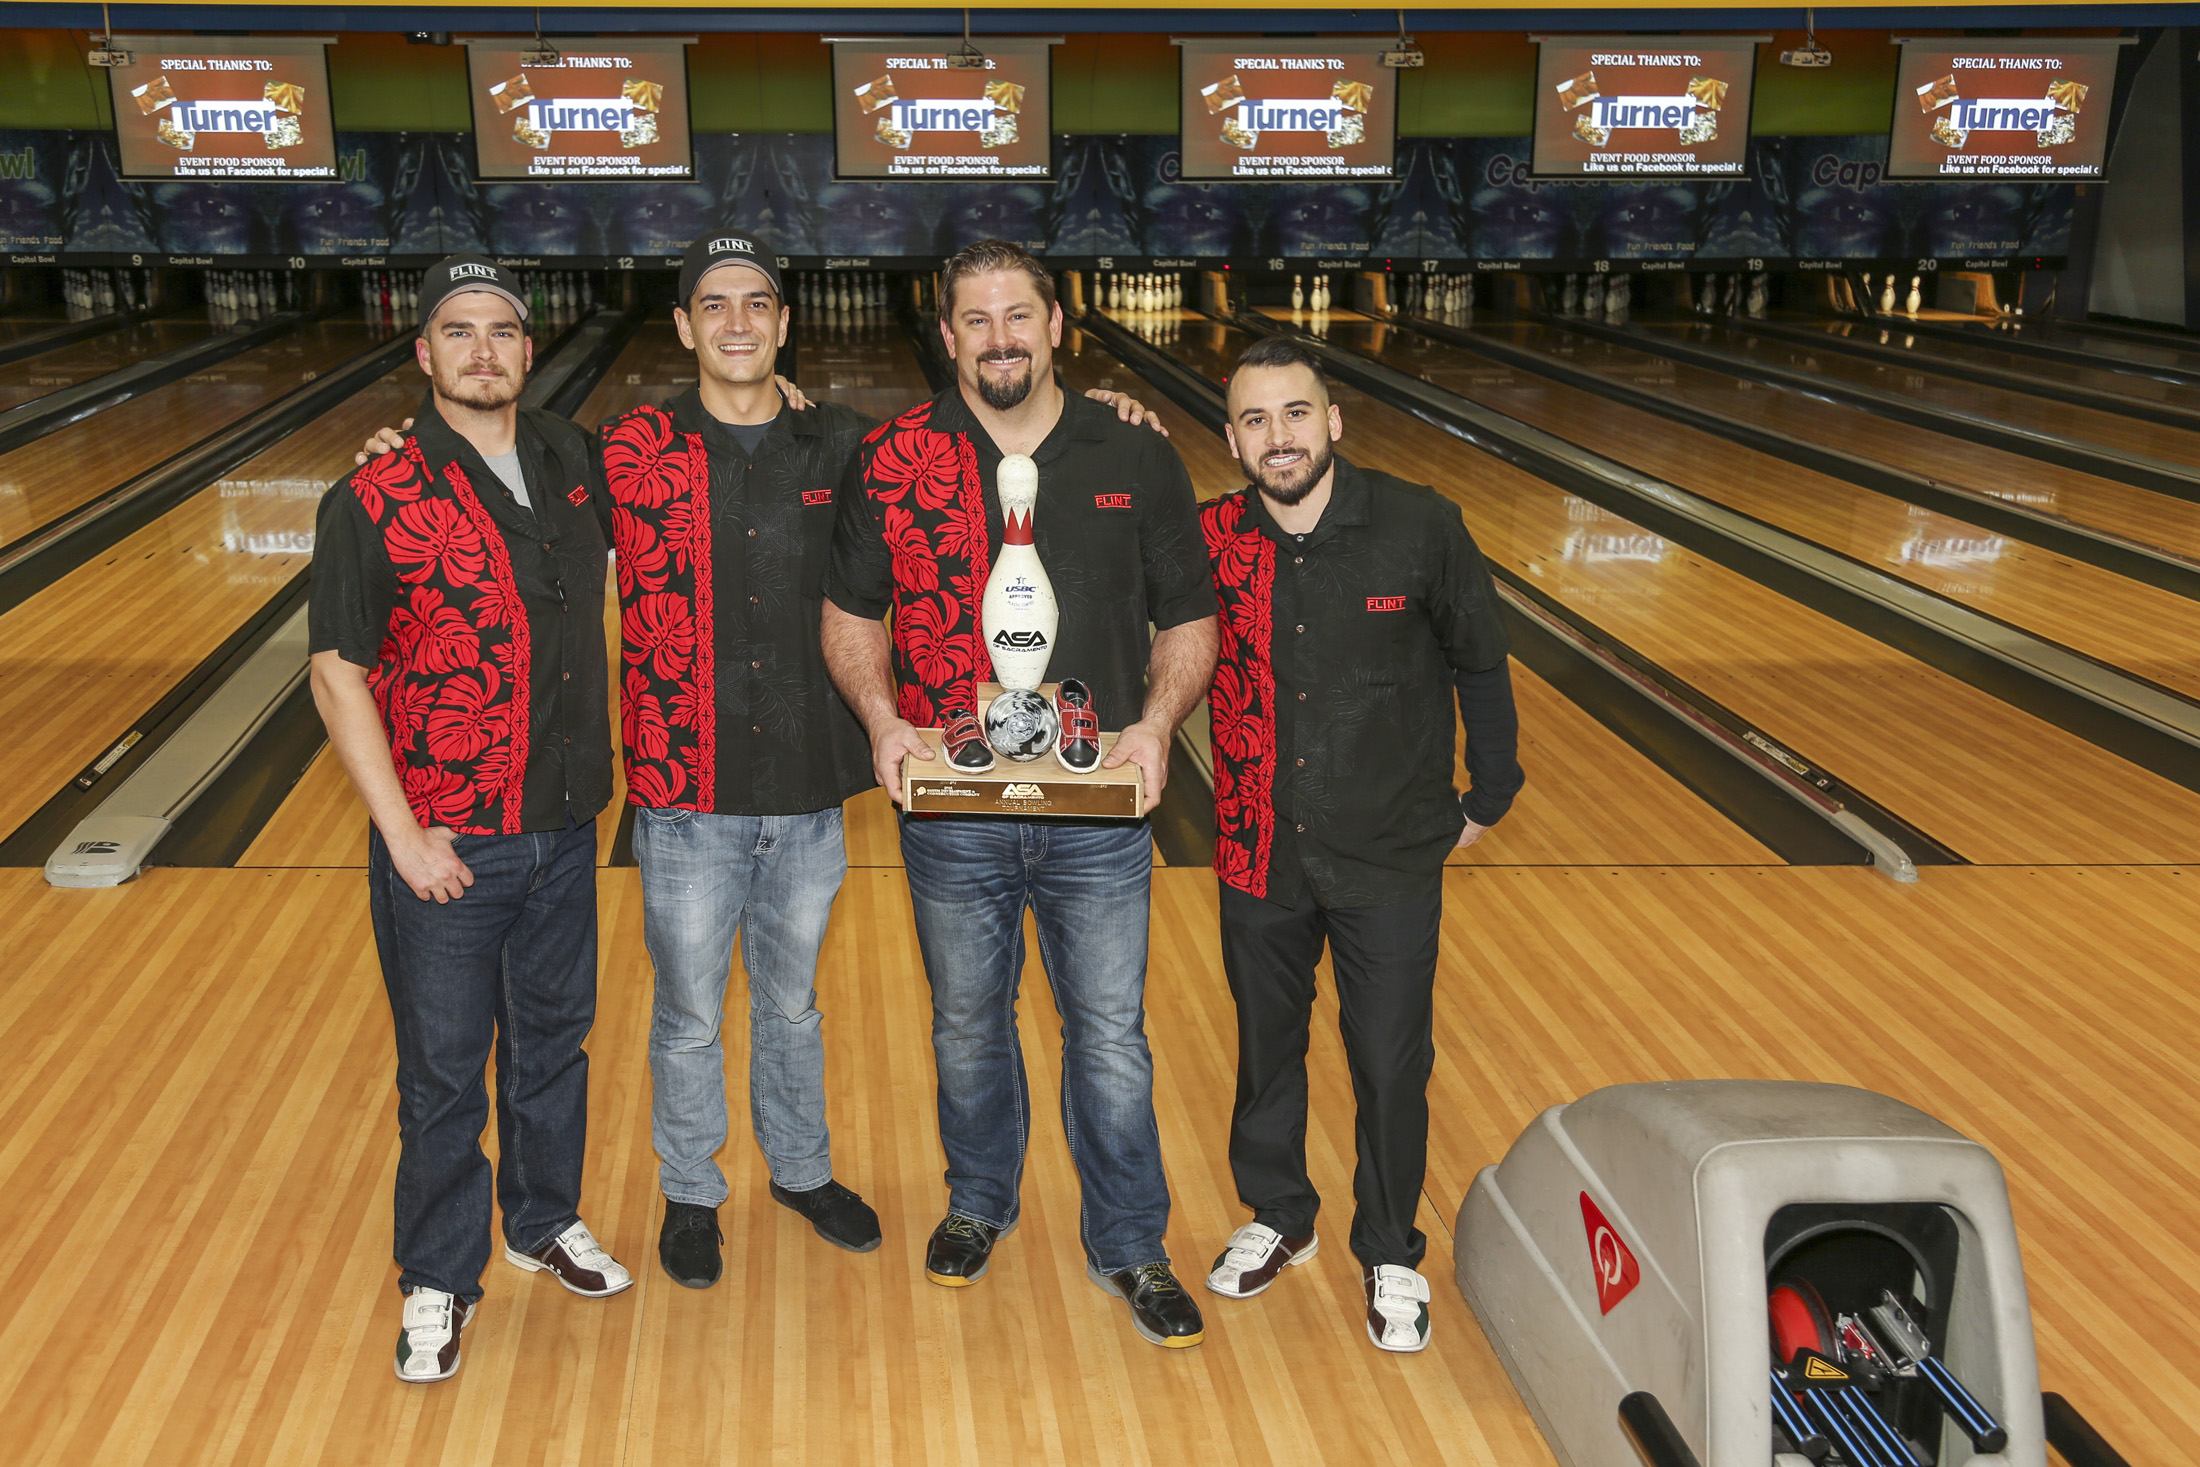 59_ASA Bowling Tourney 2019